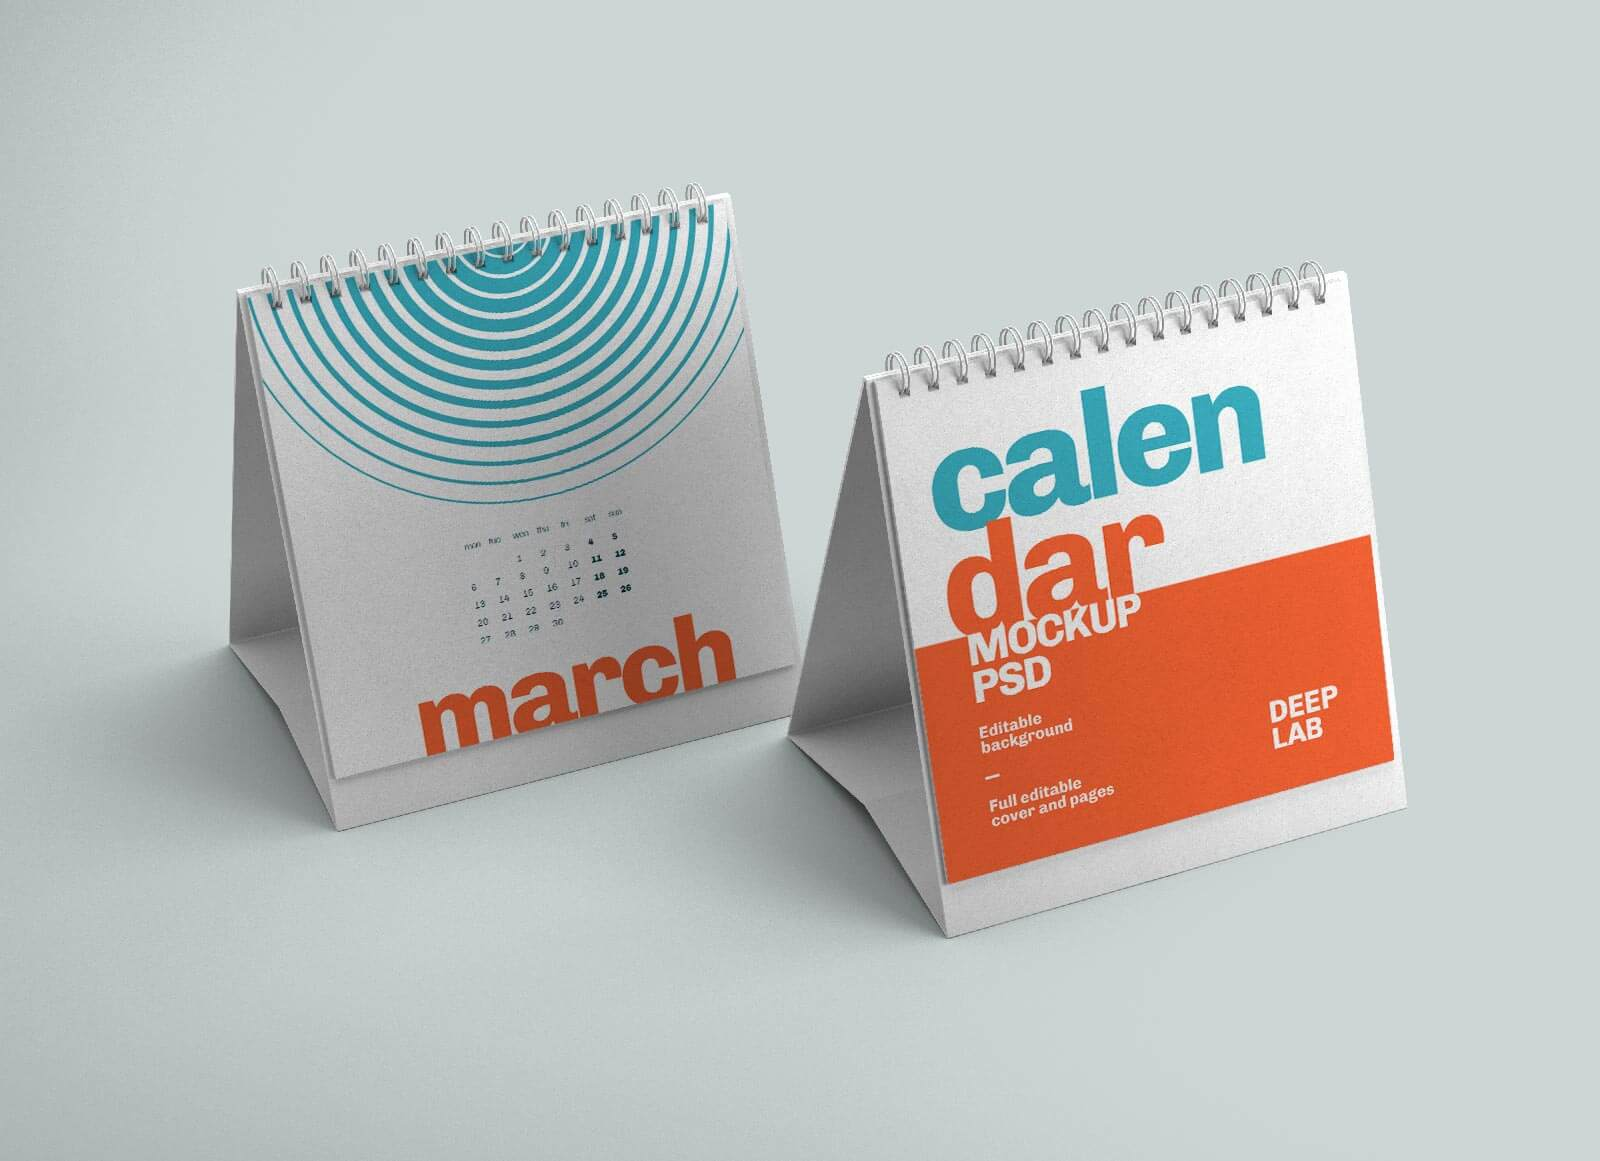 Free Square Desk Calendar 2022 Mockup PSD (4)